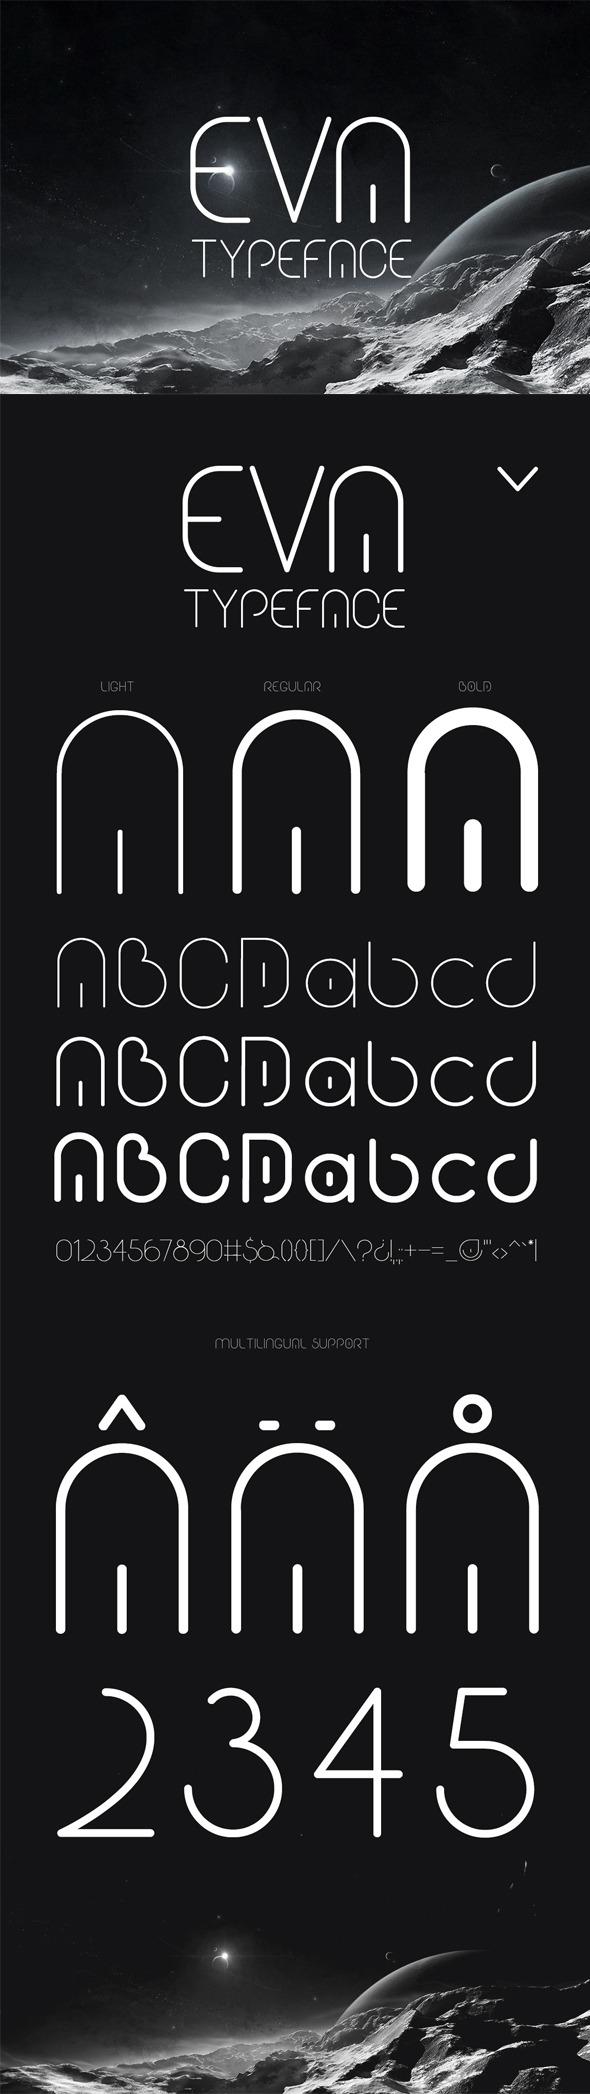 GraphicRiver Eva Typeface 11276962